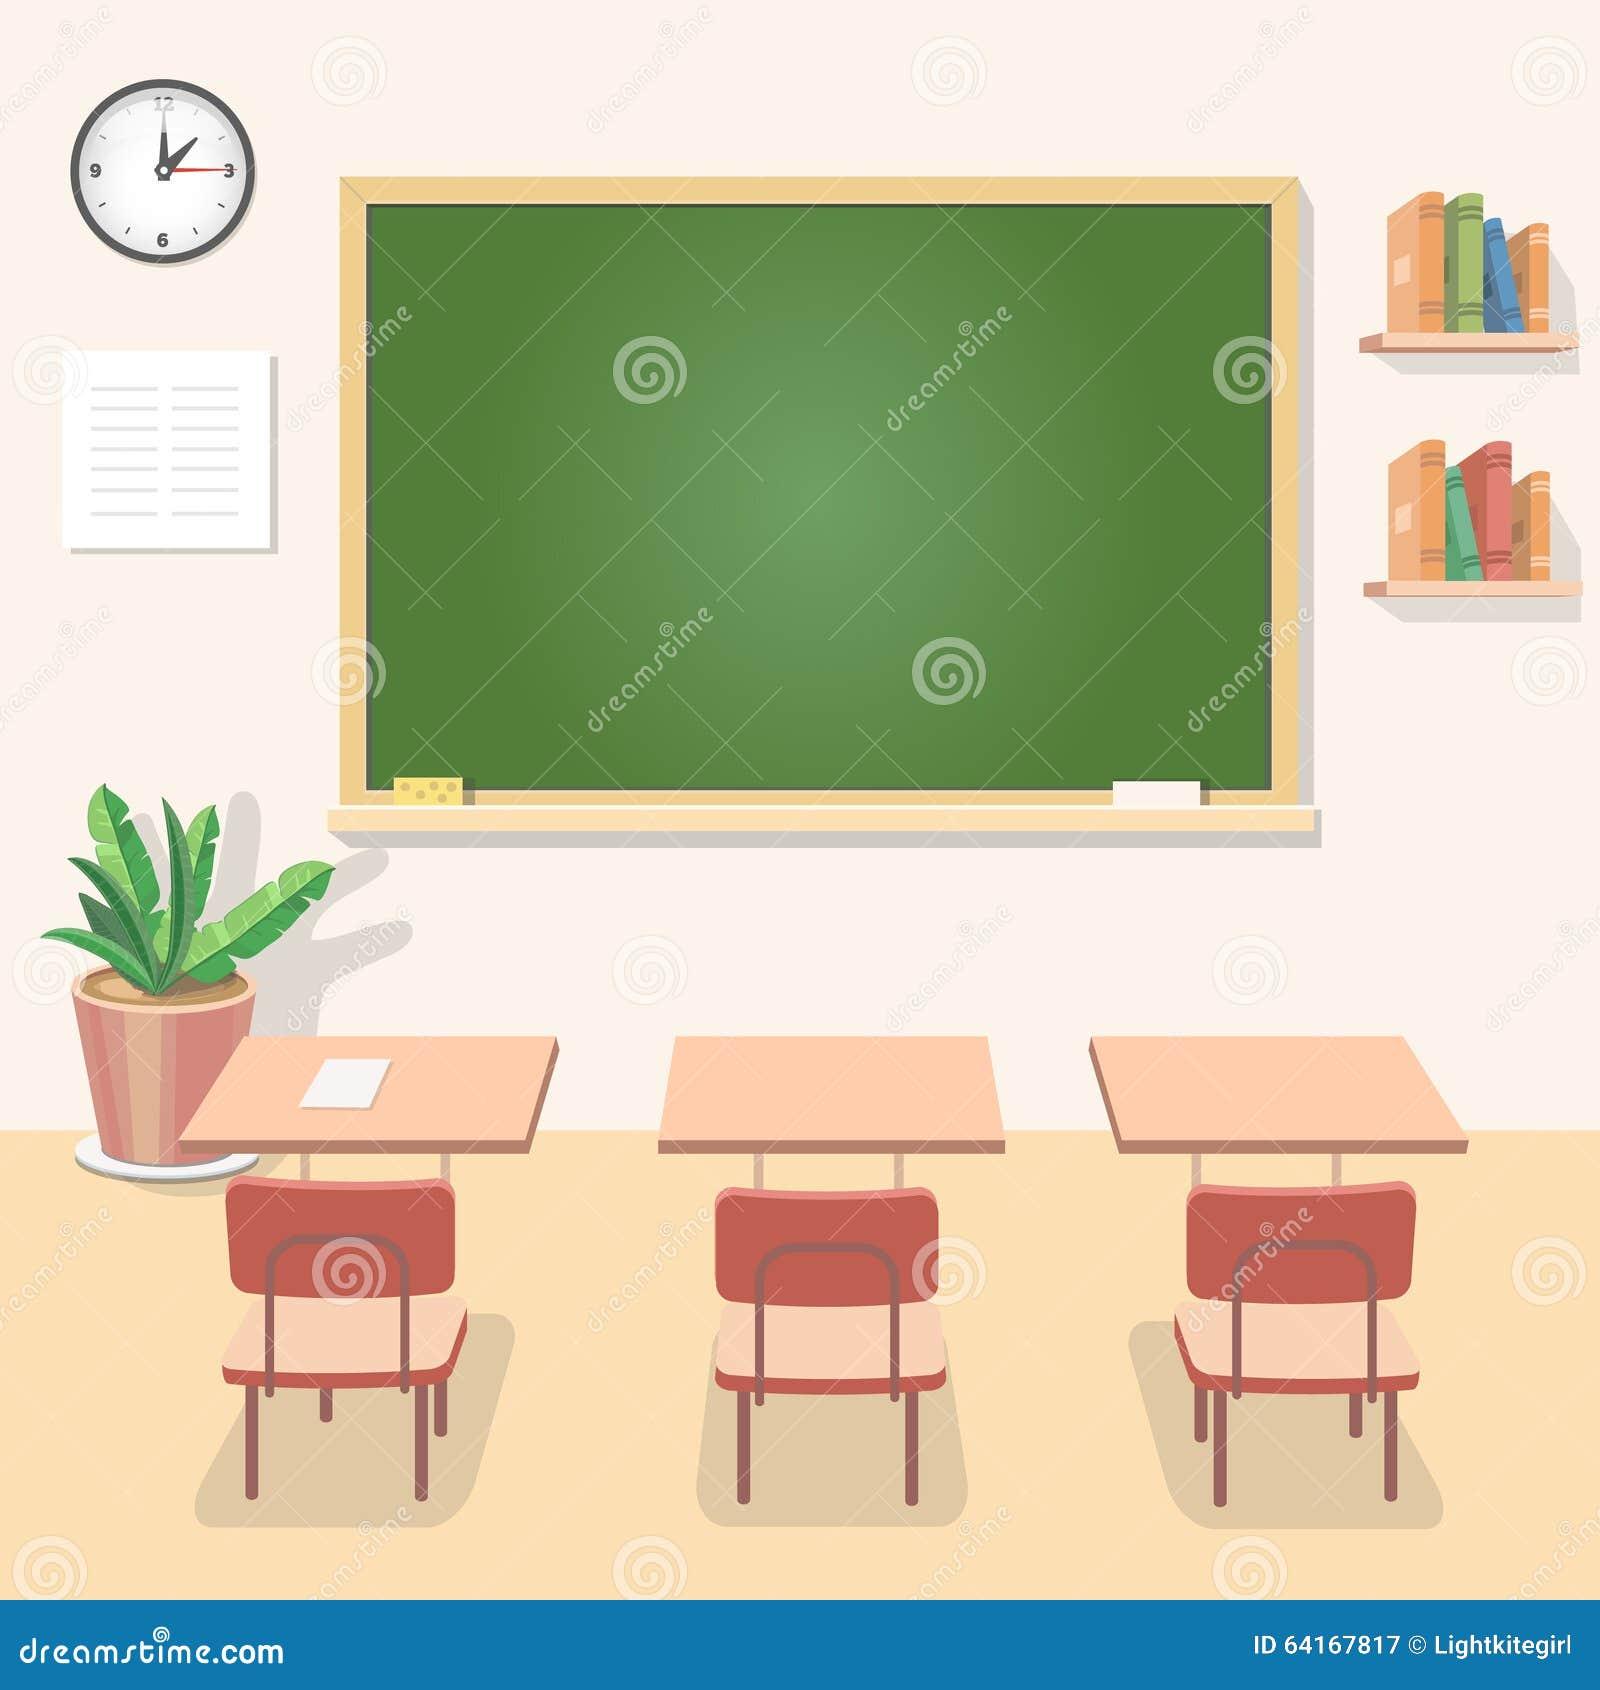 Modern Classroom Clipart ~ School classroom with chalkboard and desks class stock